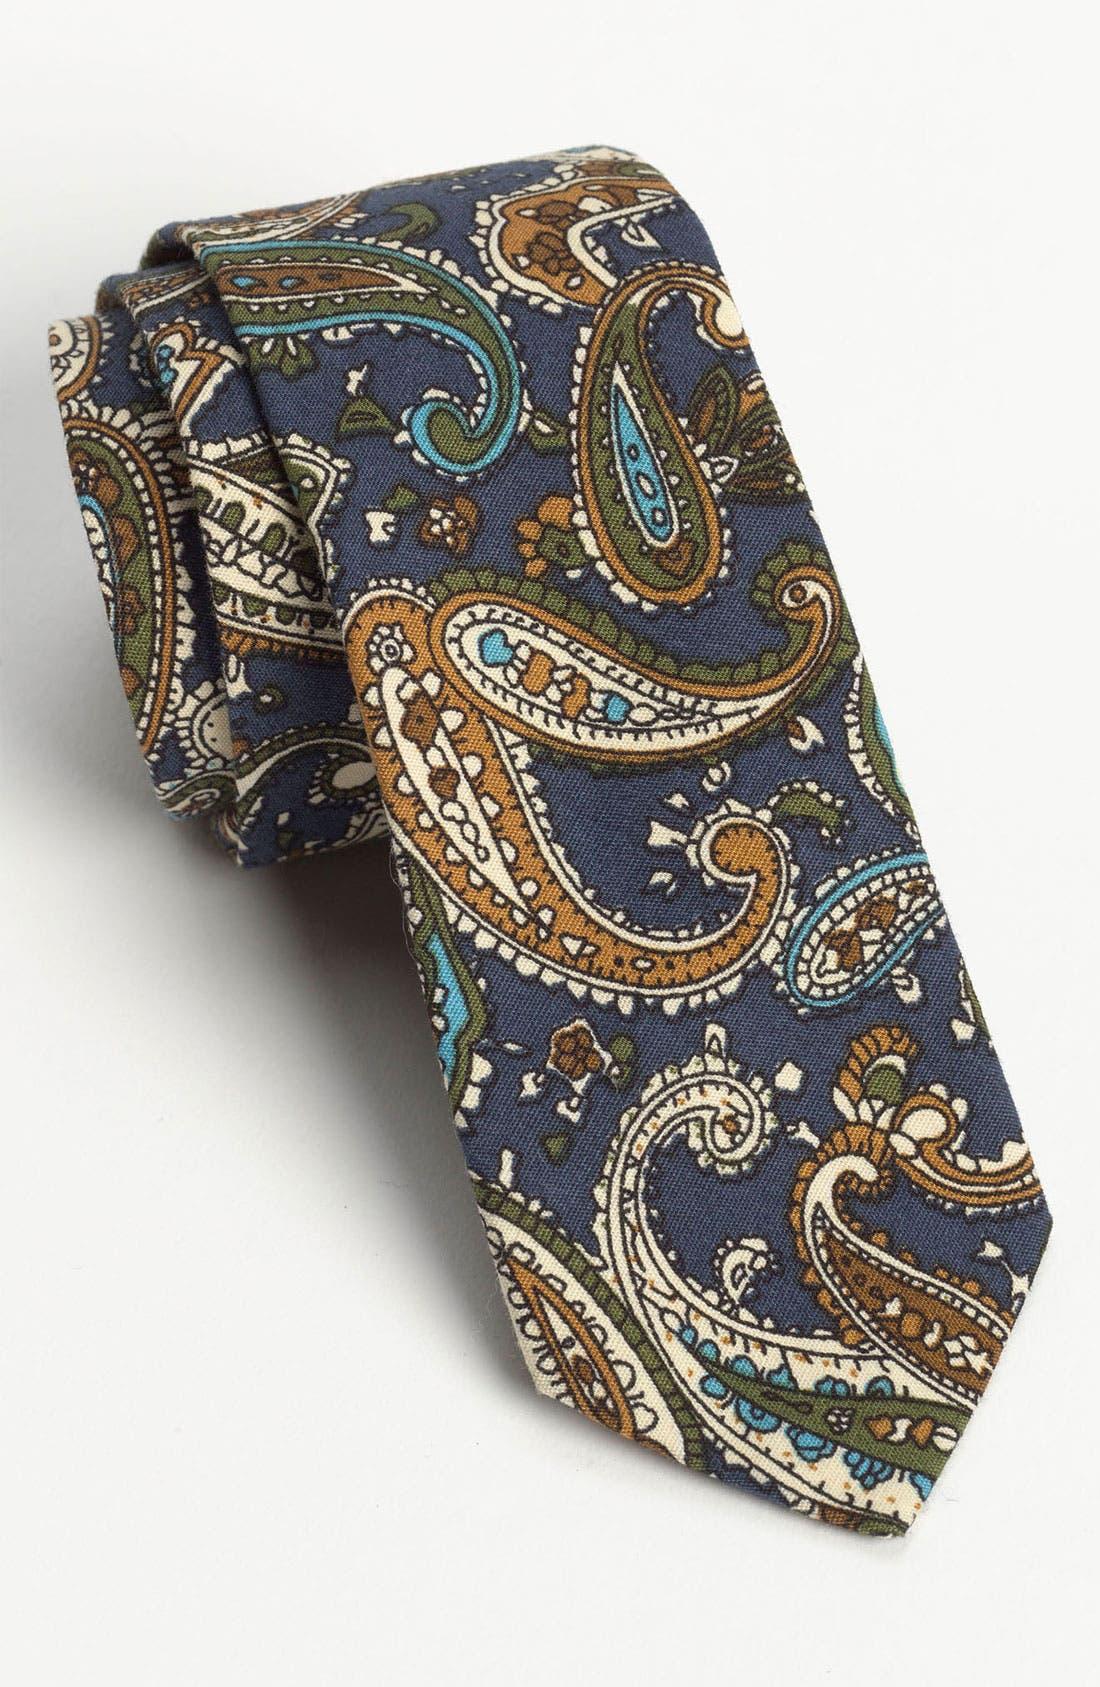 Alternate Image 1 Selected - Topman Paisley Print Woven Cotton Tie